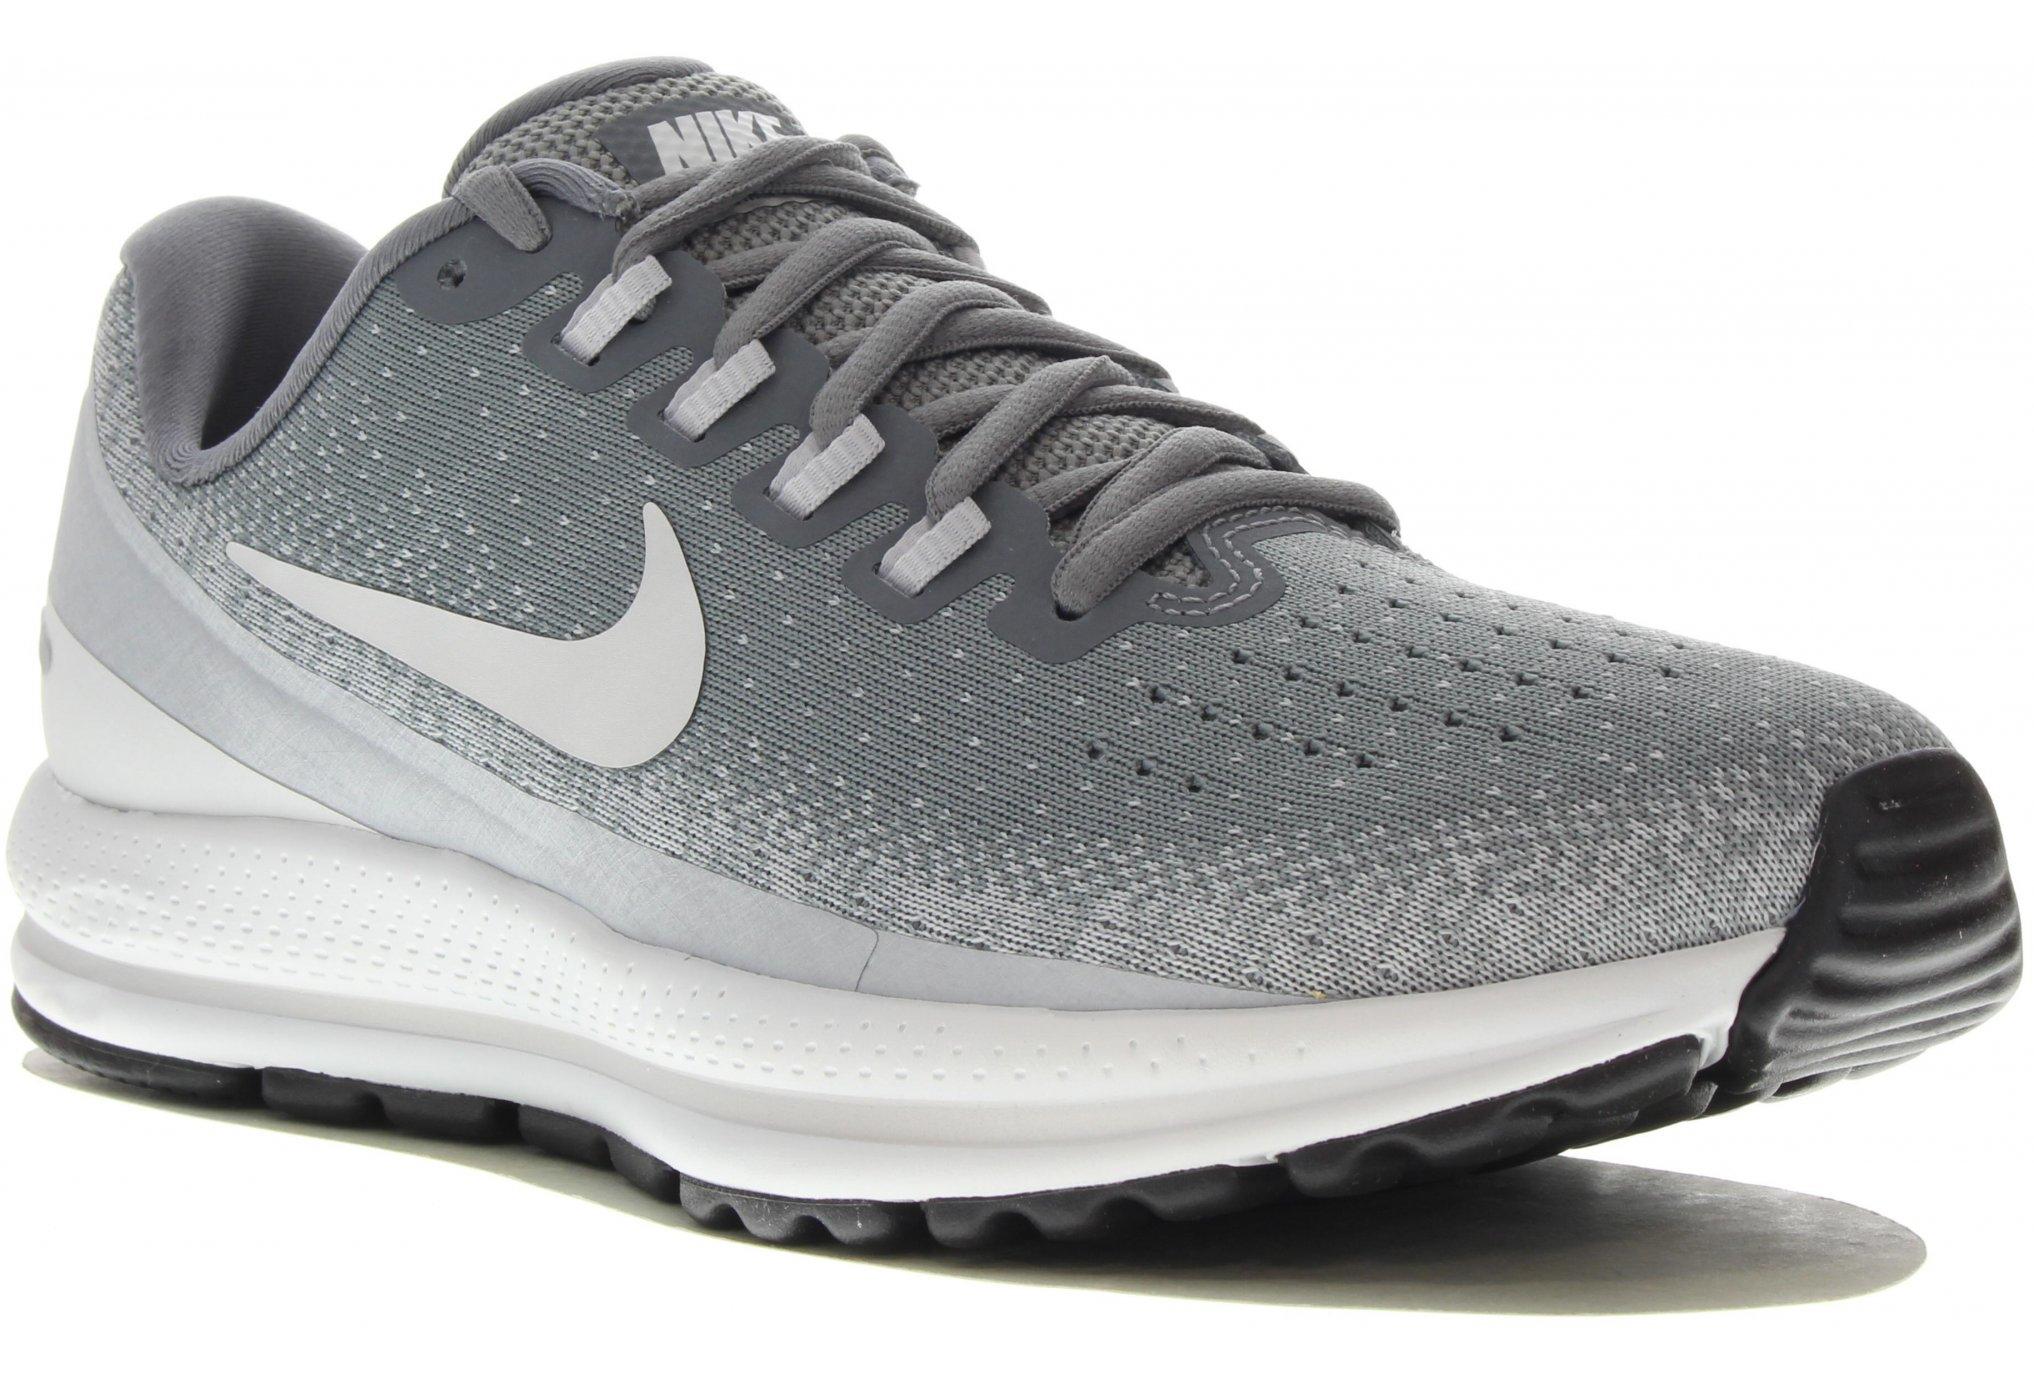 Nike Air Zoom Vomero 13 déstockage running